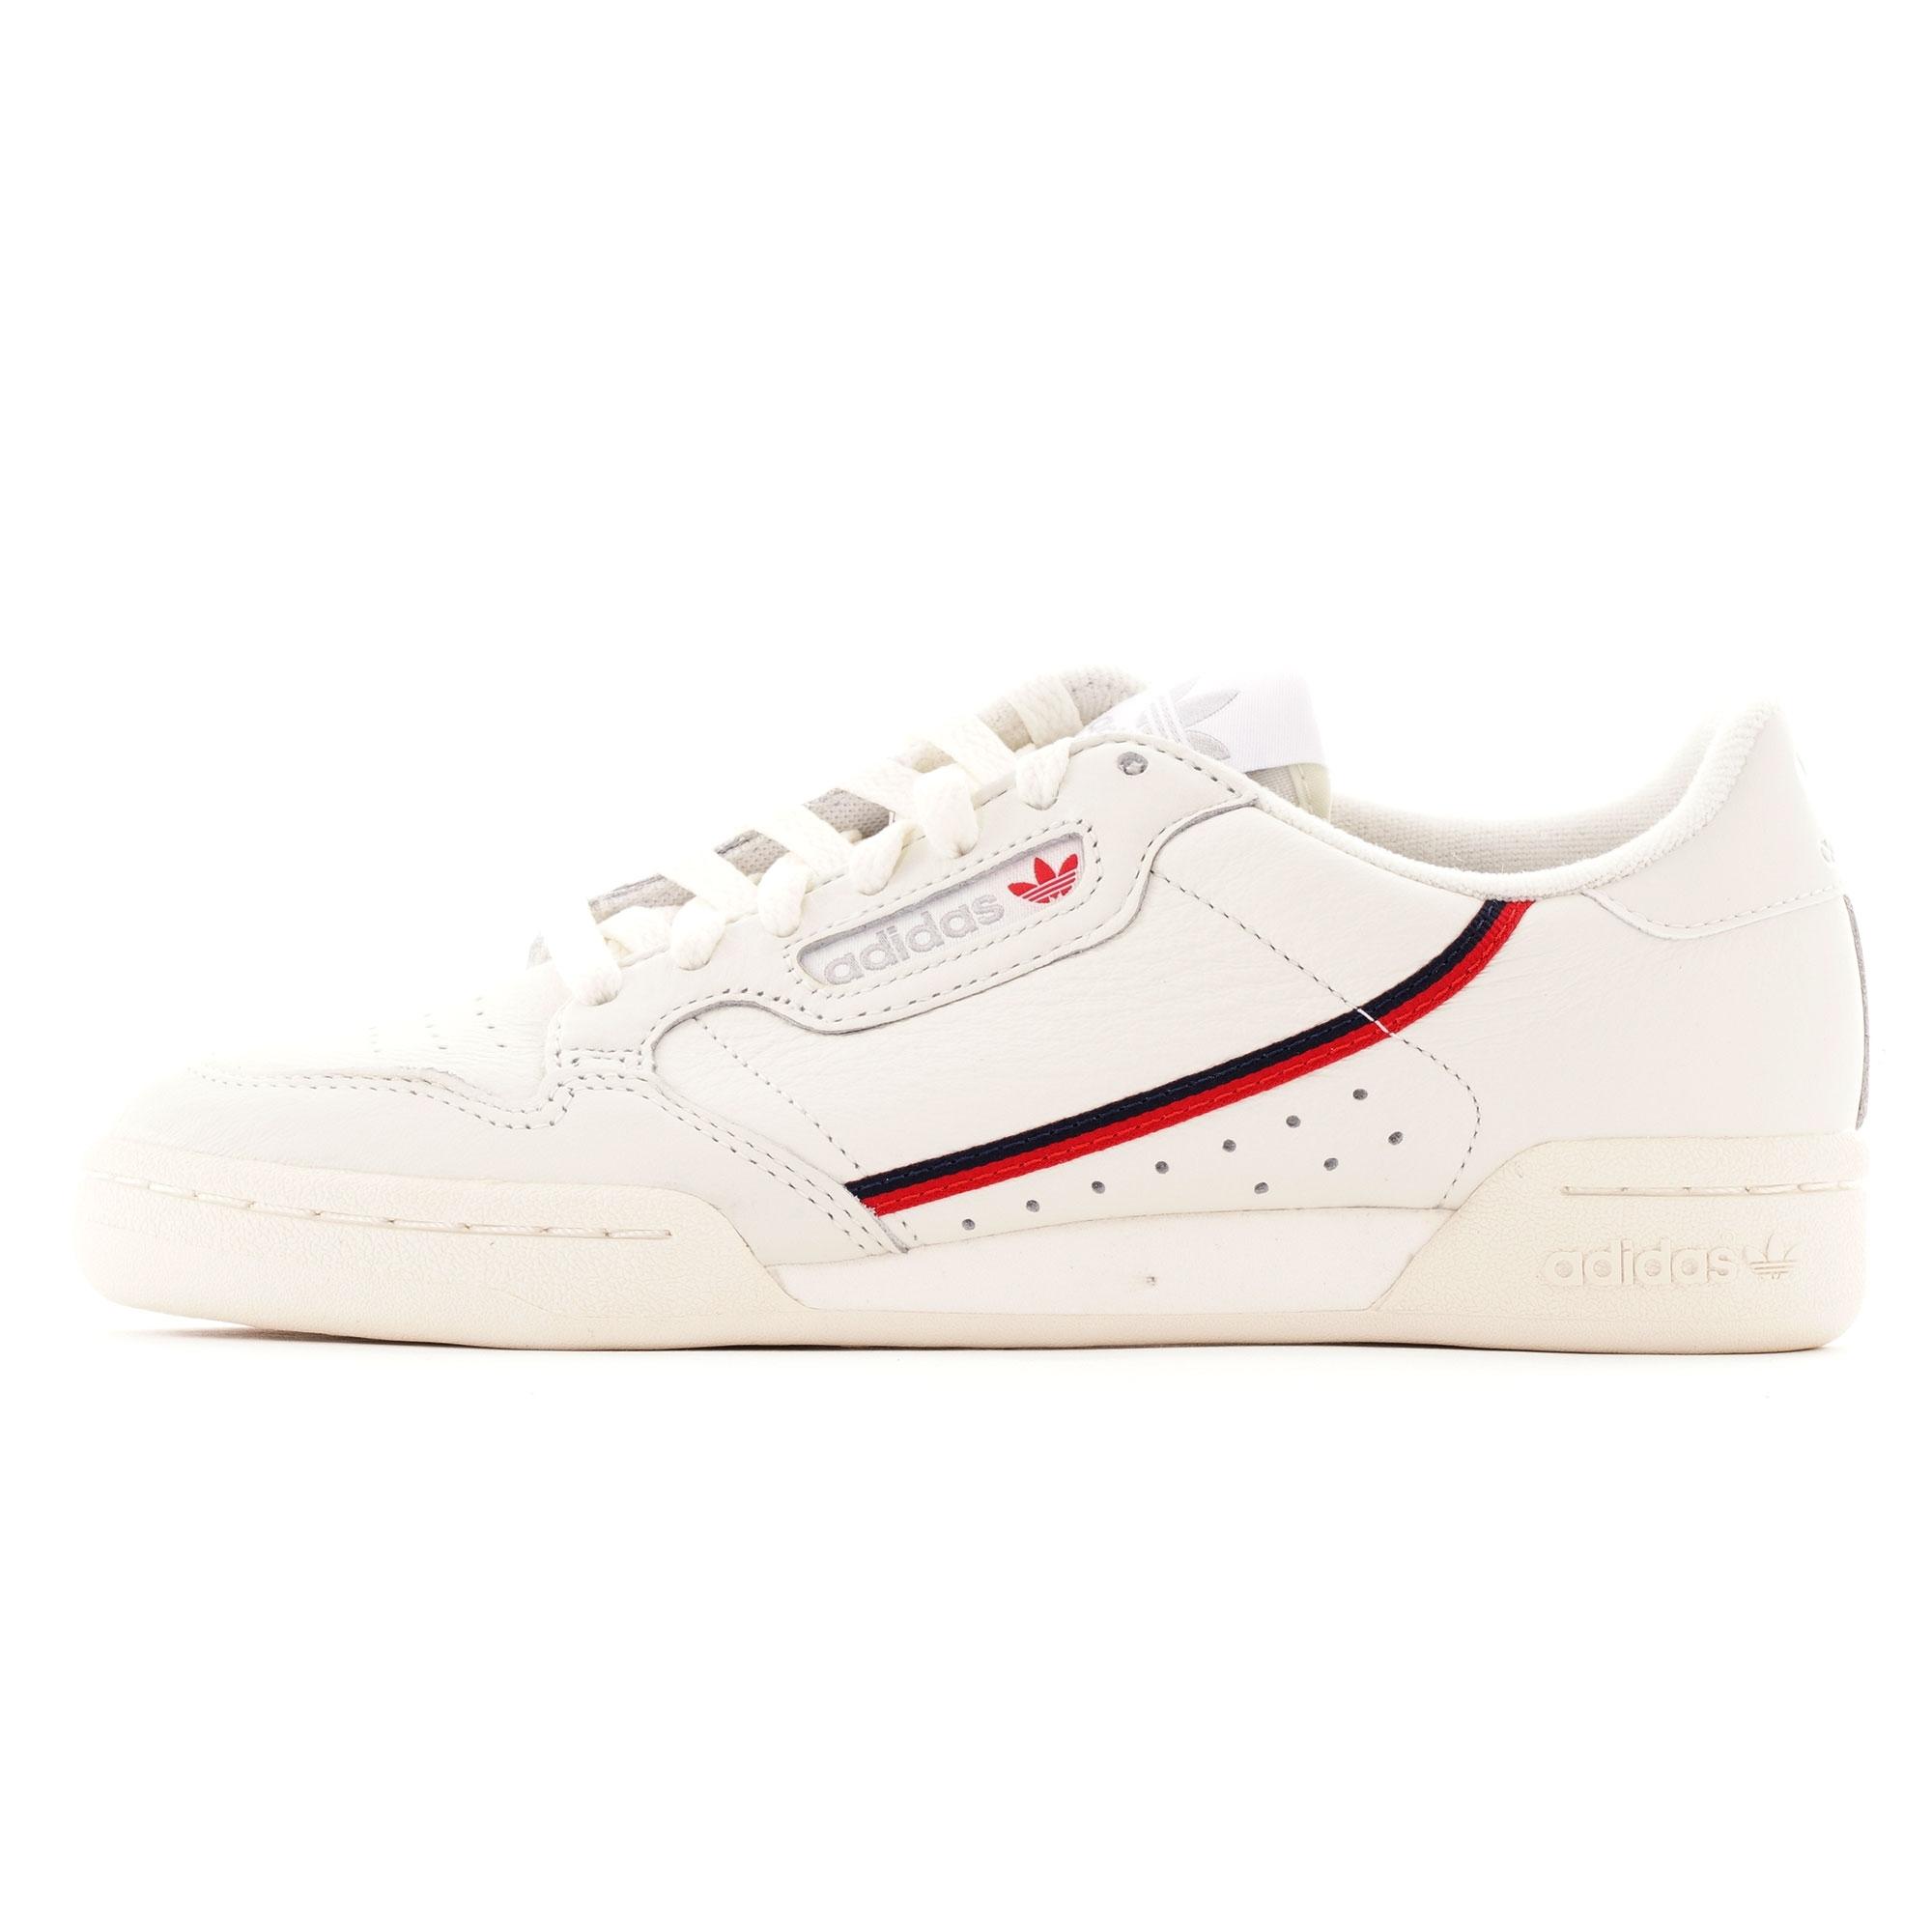 Adidas Originals Continental 80 - Off White & Scarlet